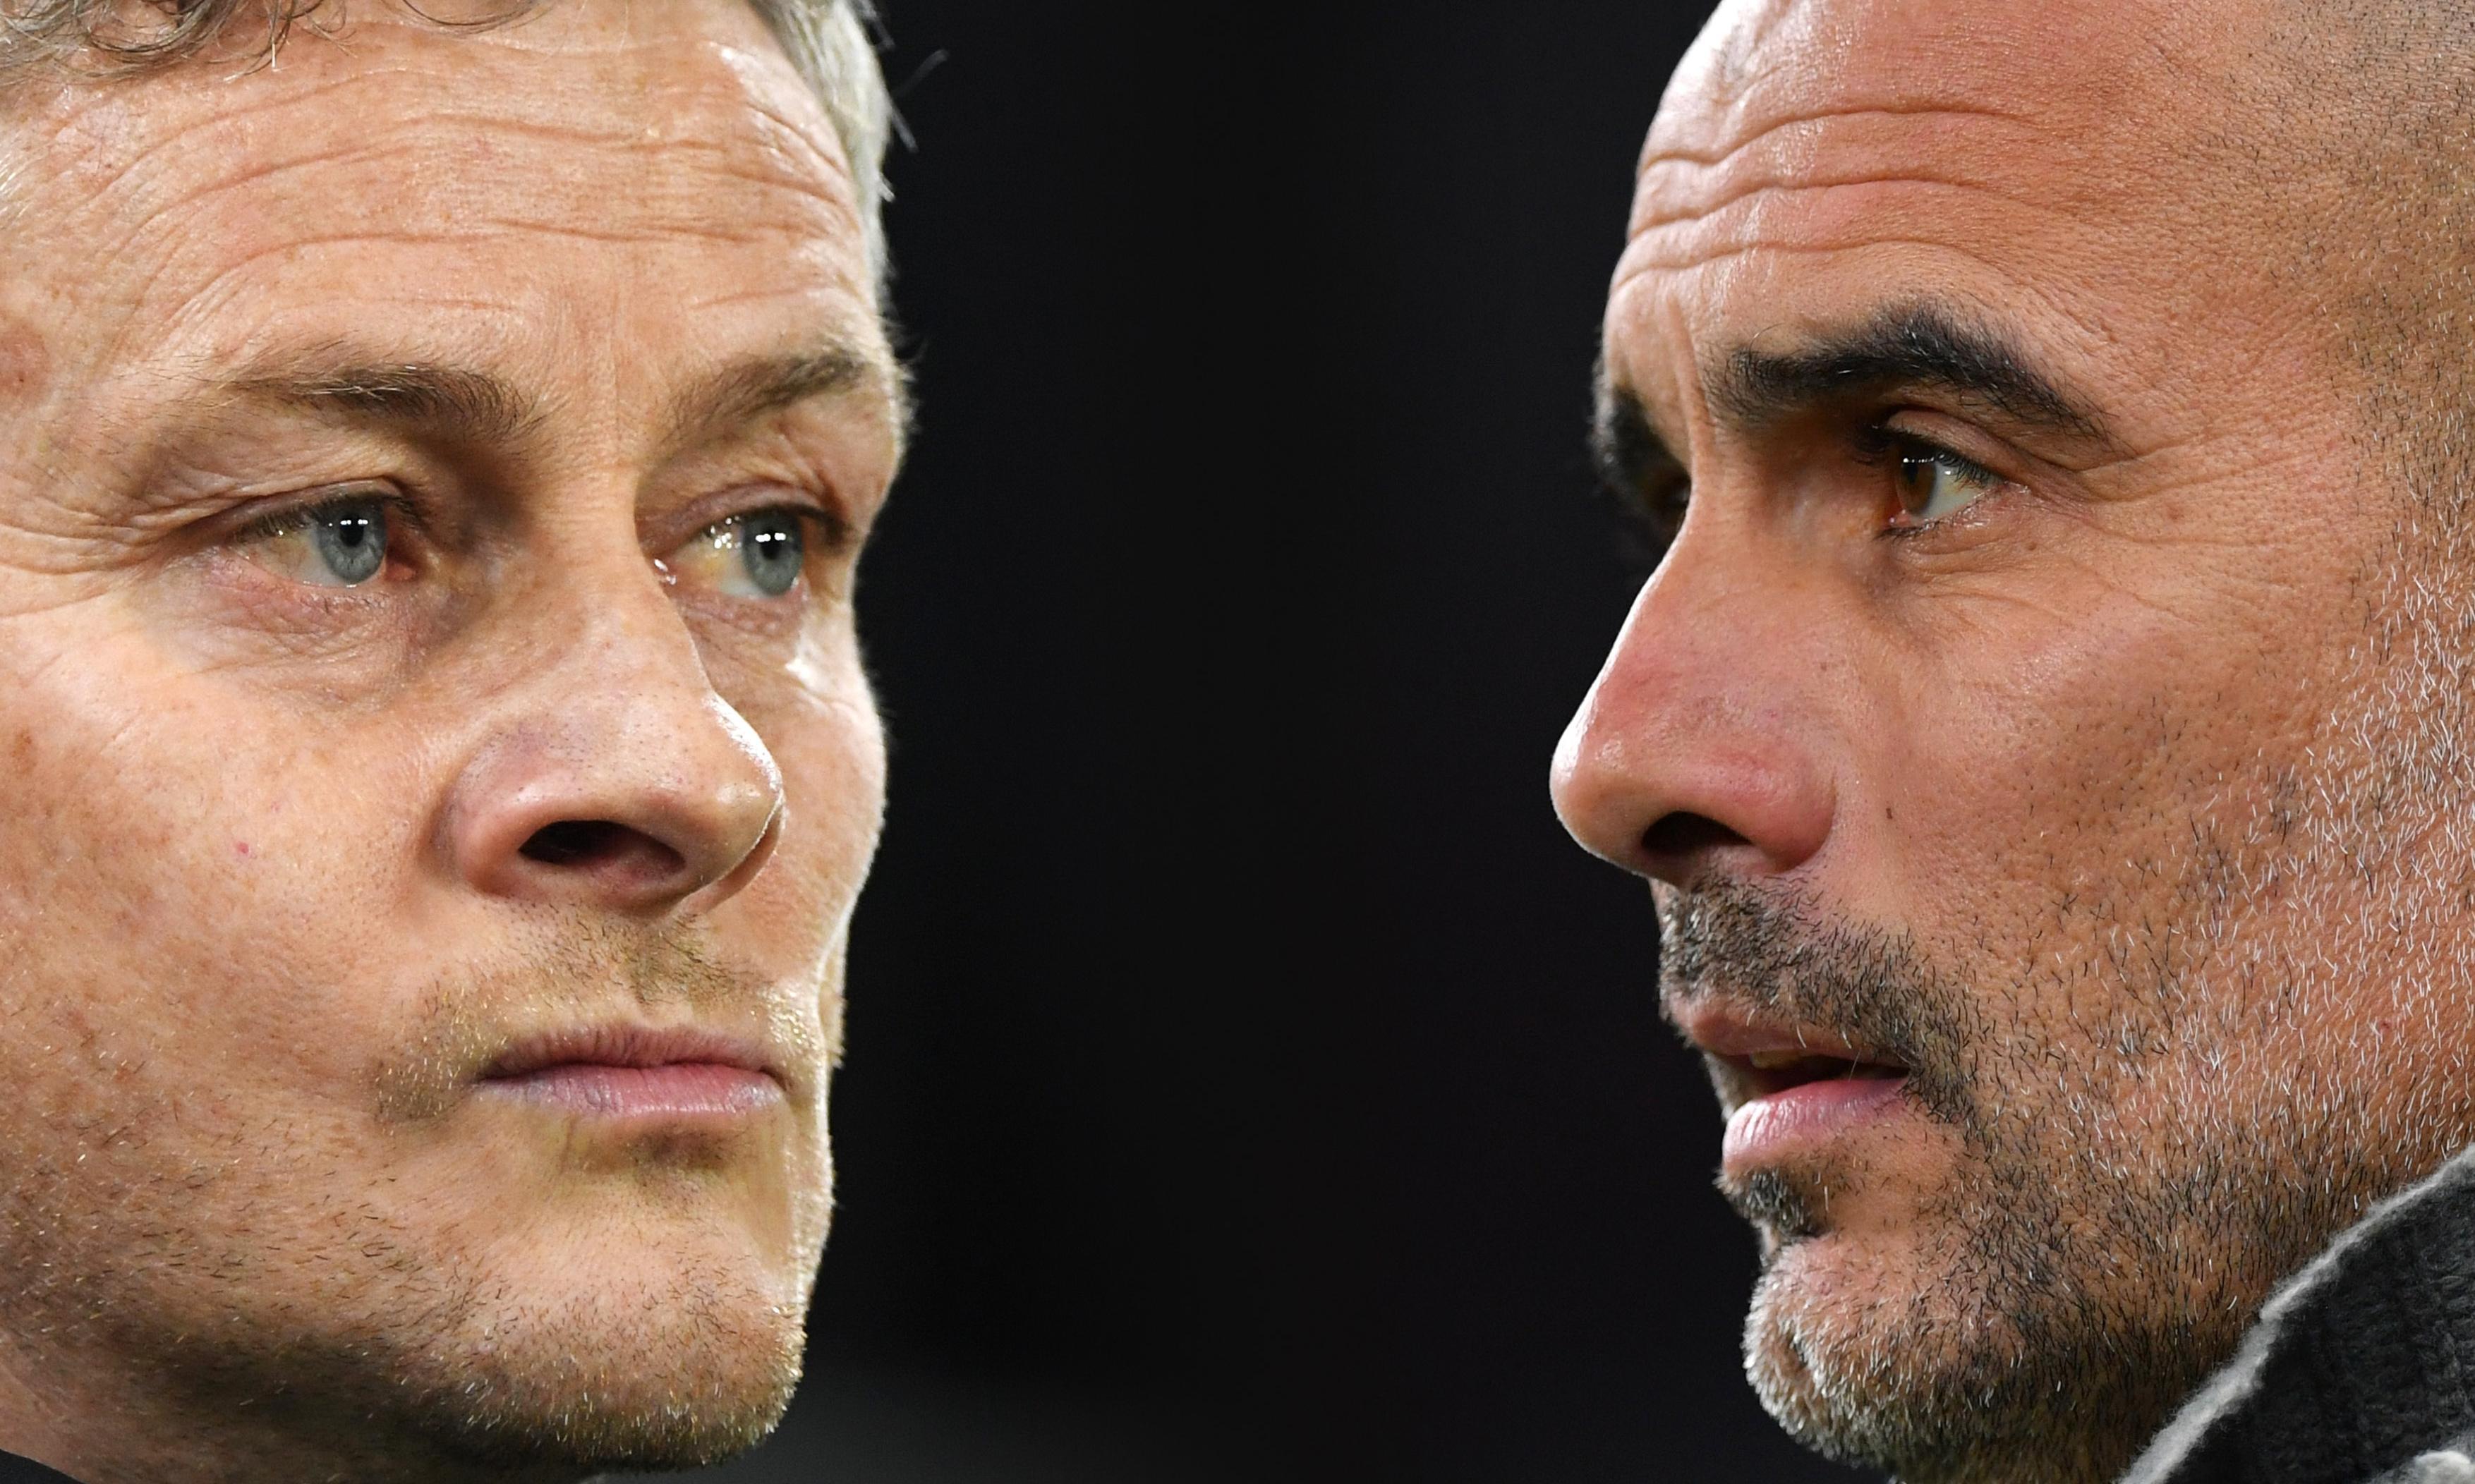 Pep Guardiola hits back at Ole Gunnar Solskjær over 'foul' accusations